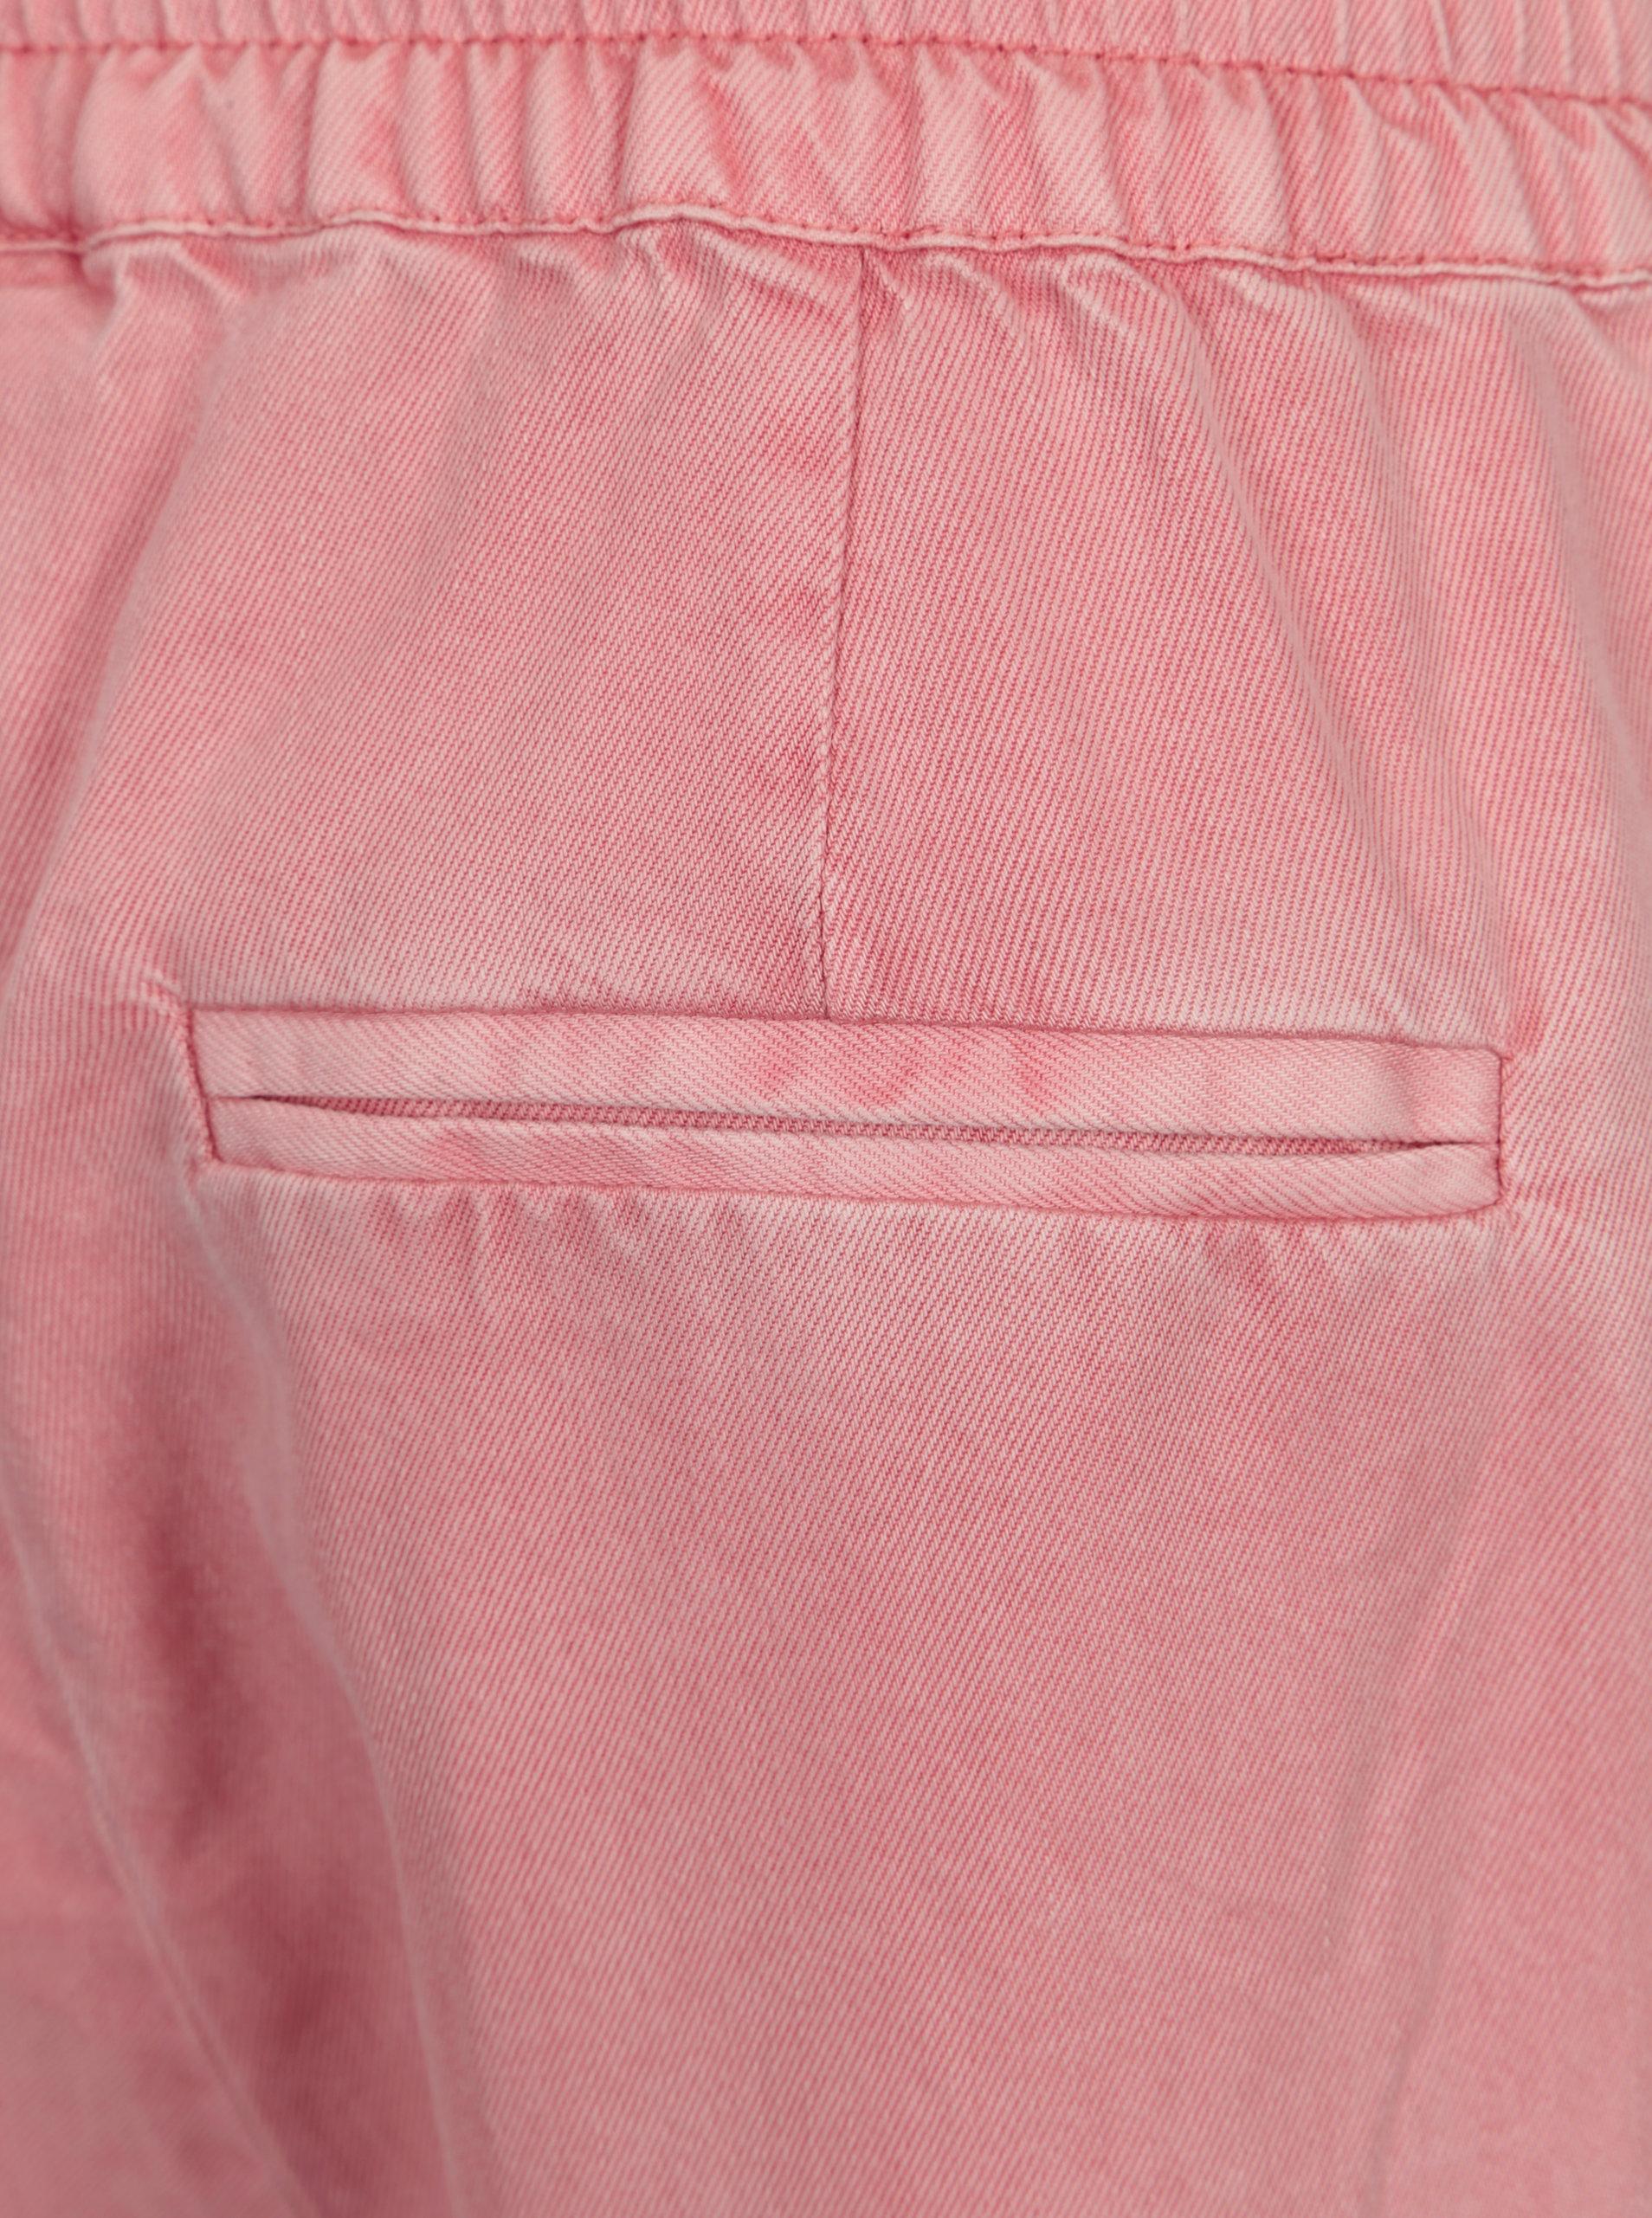 941e1eb97bbc Ružové nohavice VEOR MODA Rory ...